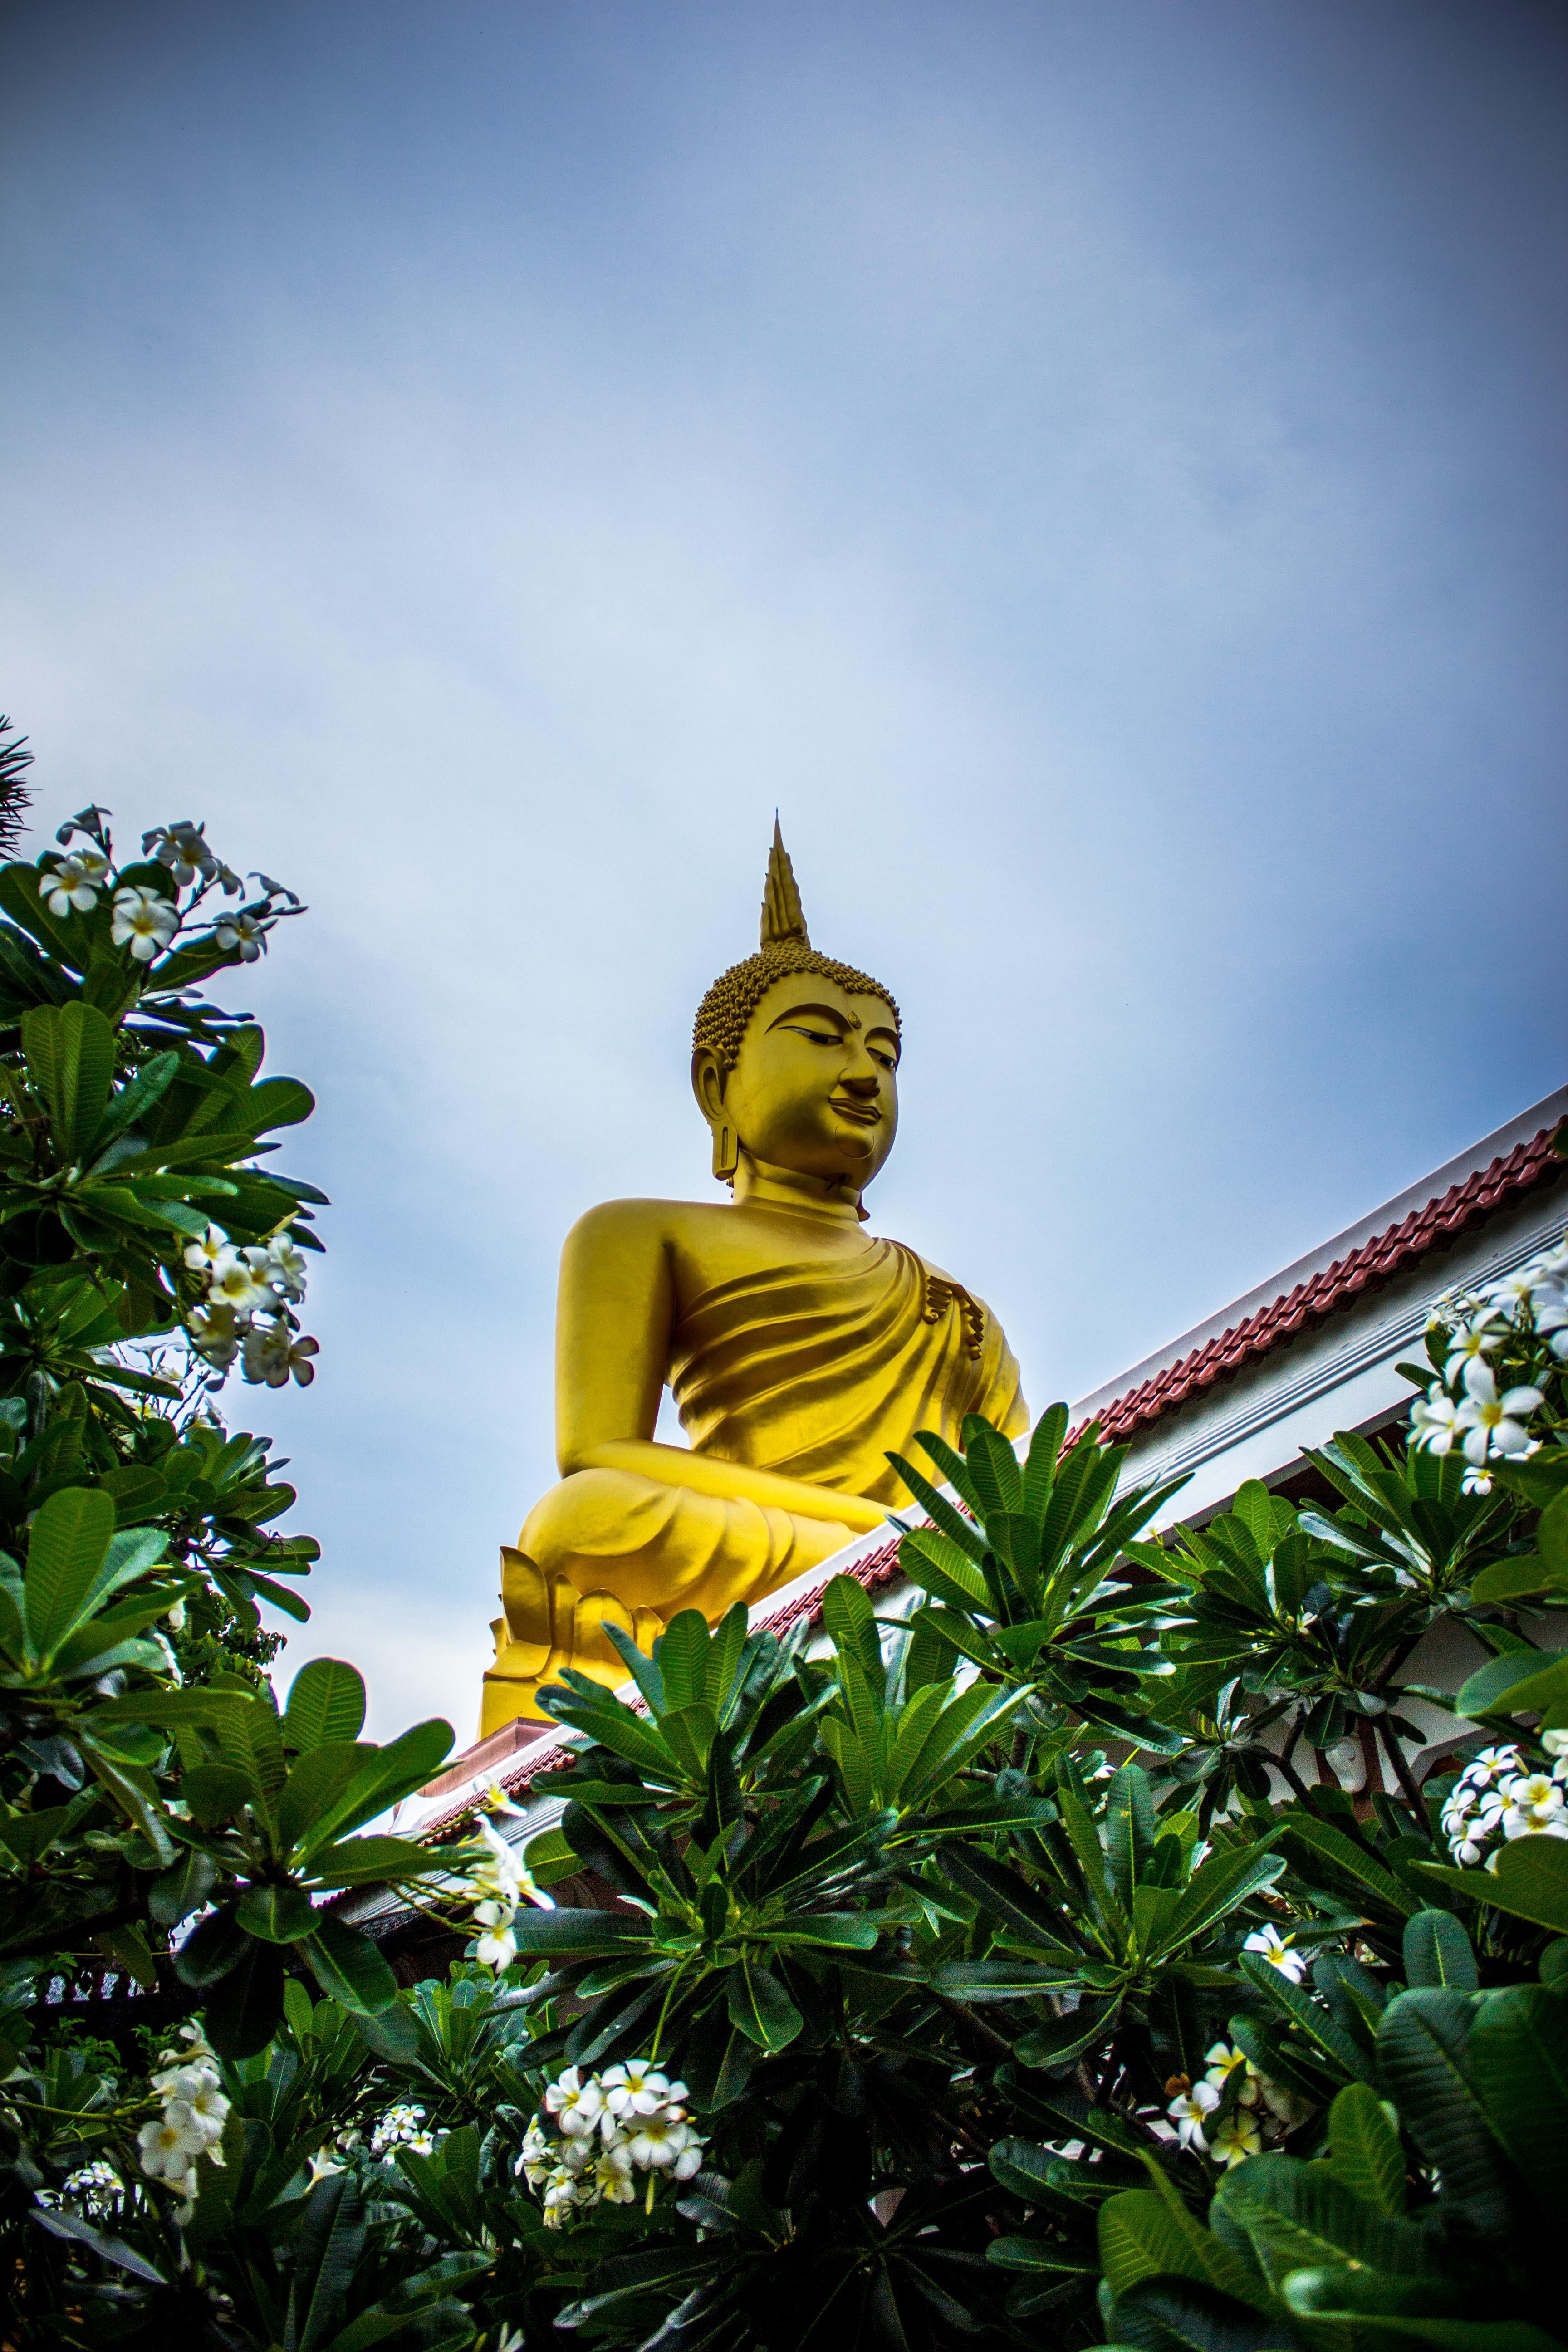 Gautama buddha statue near green leaves photo